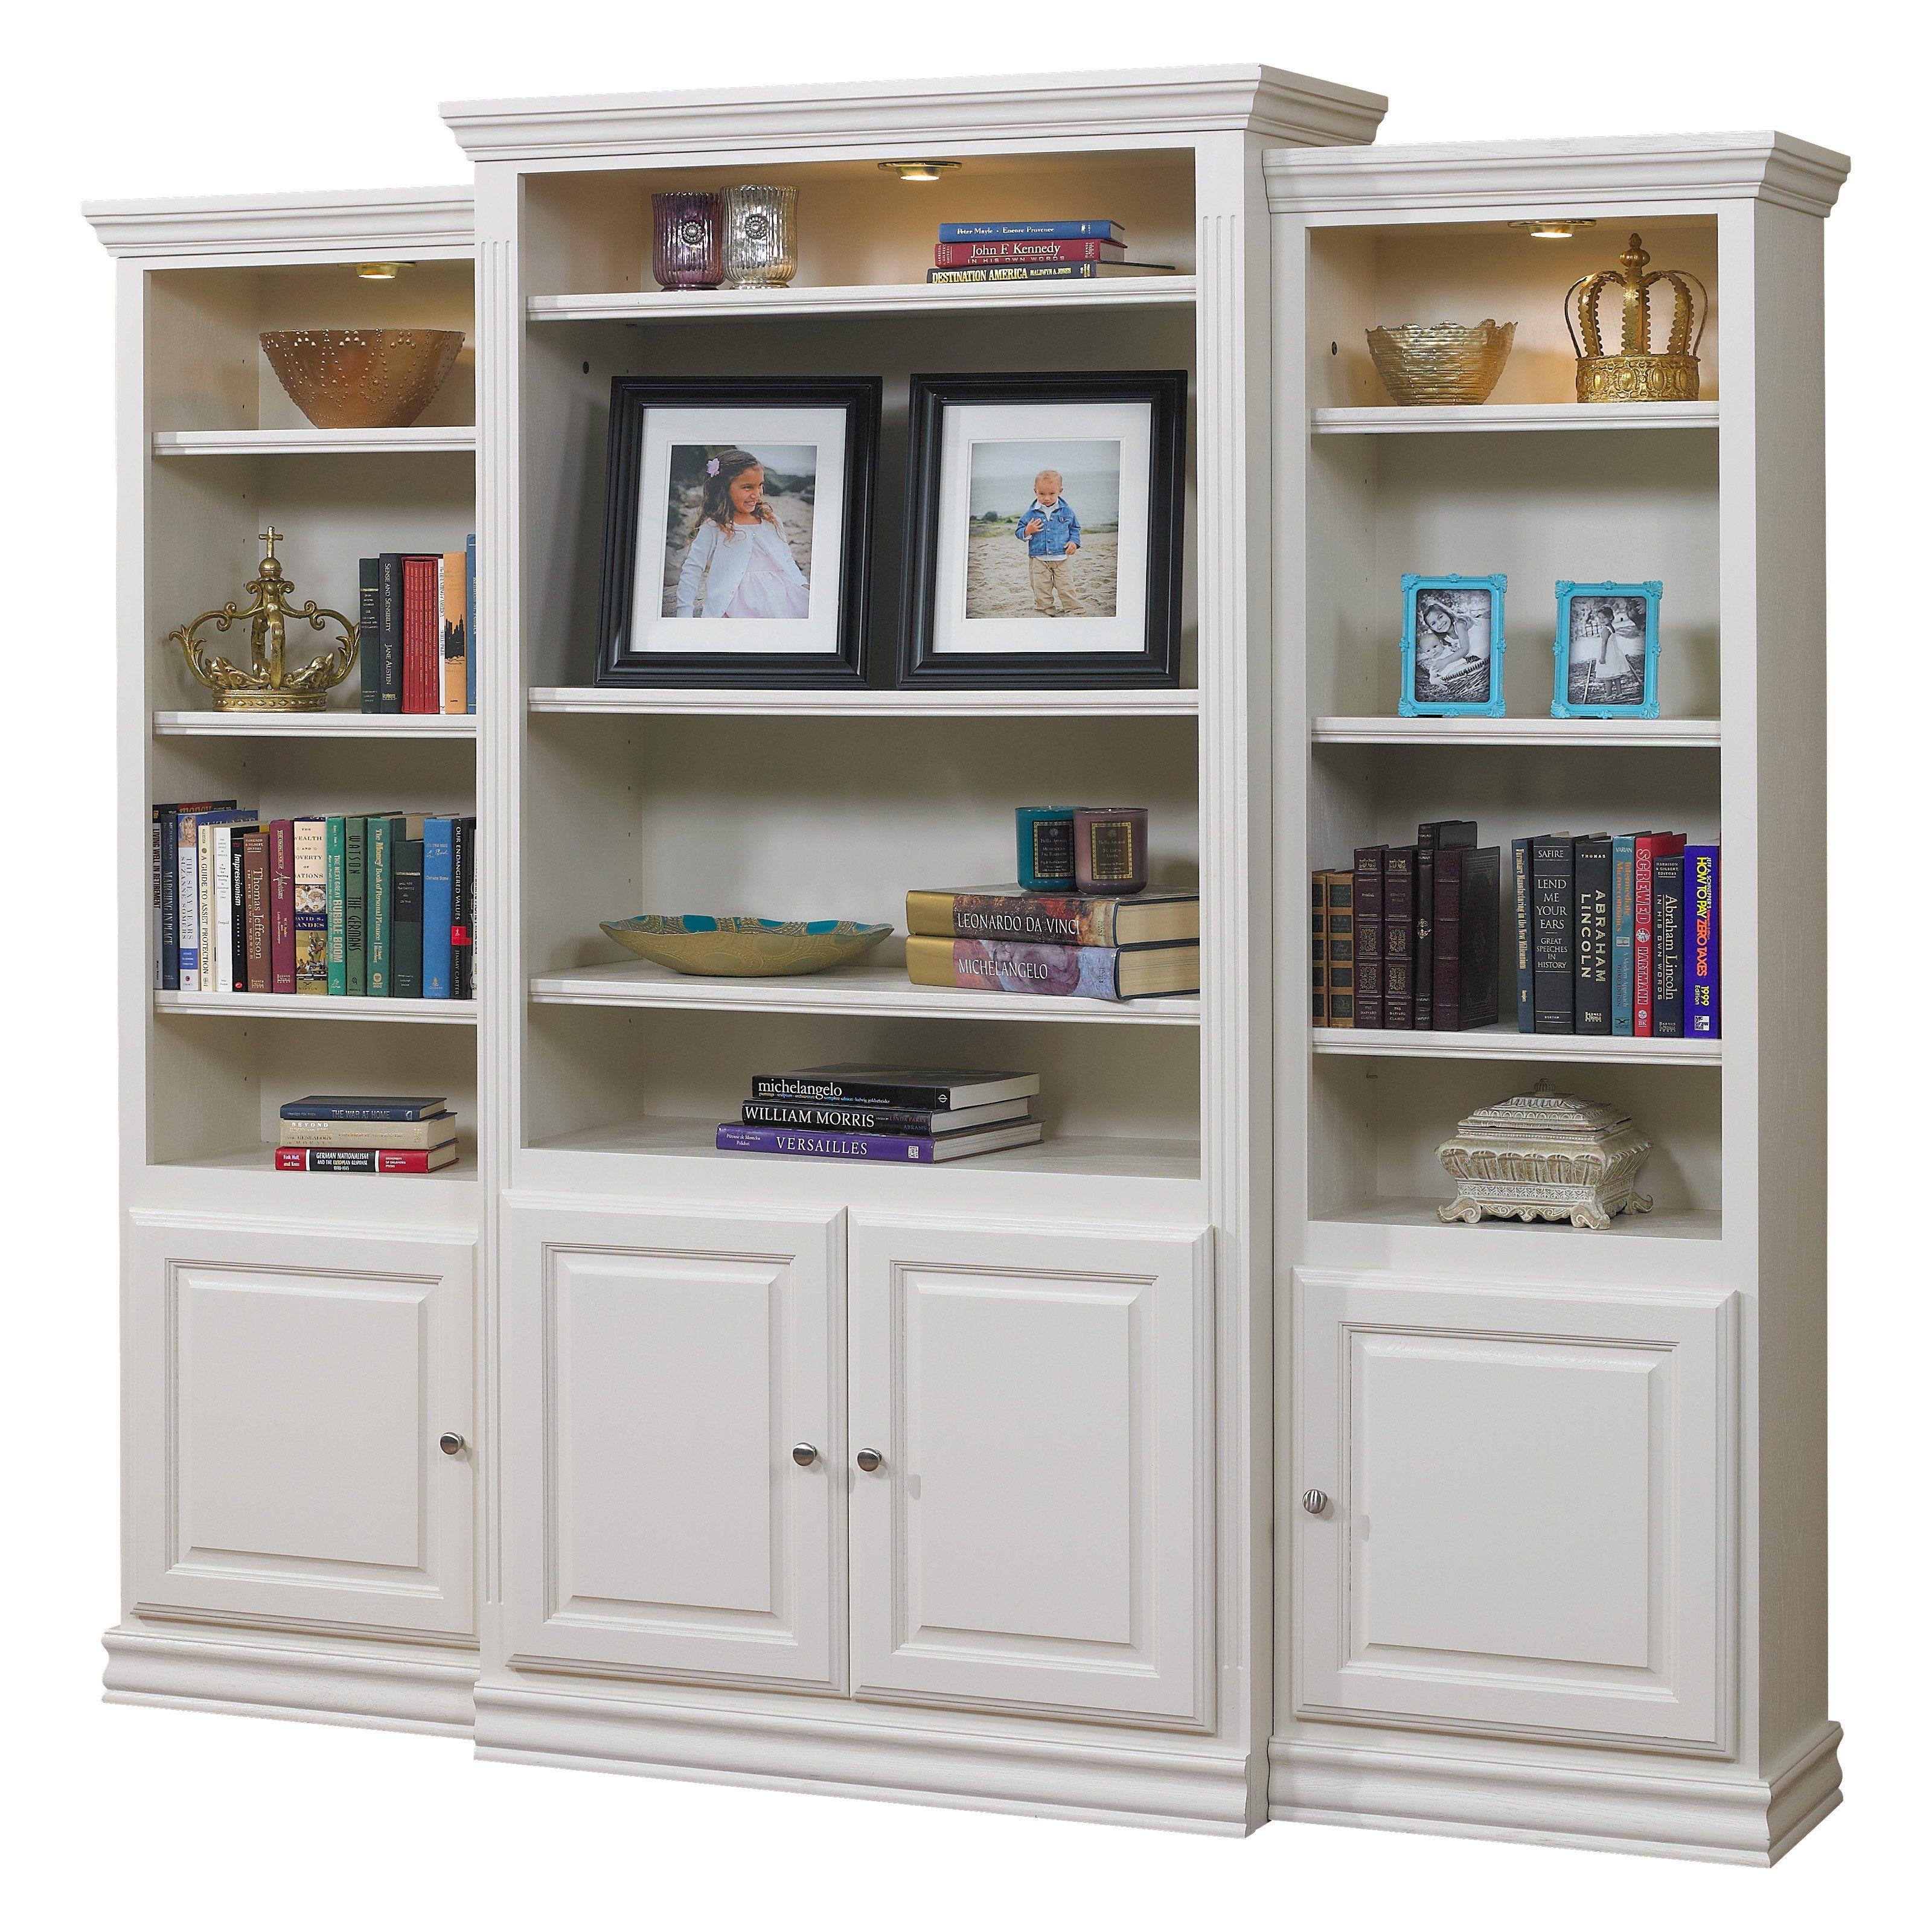 a & e kamran wall bookcase pearl white A & E Kamran Wall Bookcase   Pearl White in 2018 | Living Room  a & e kamran wall bookcase pearl white